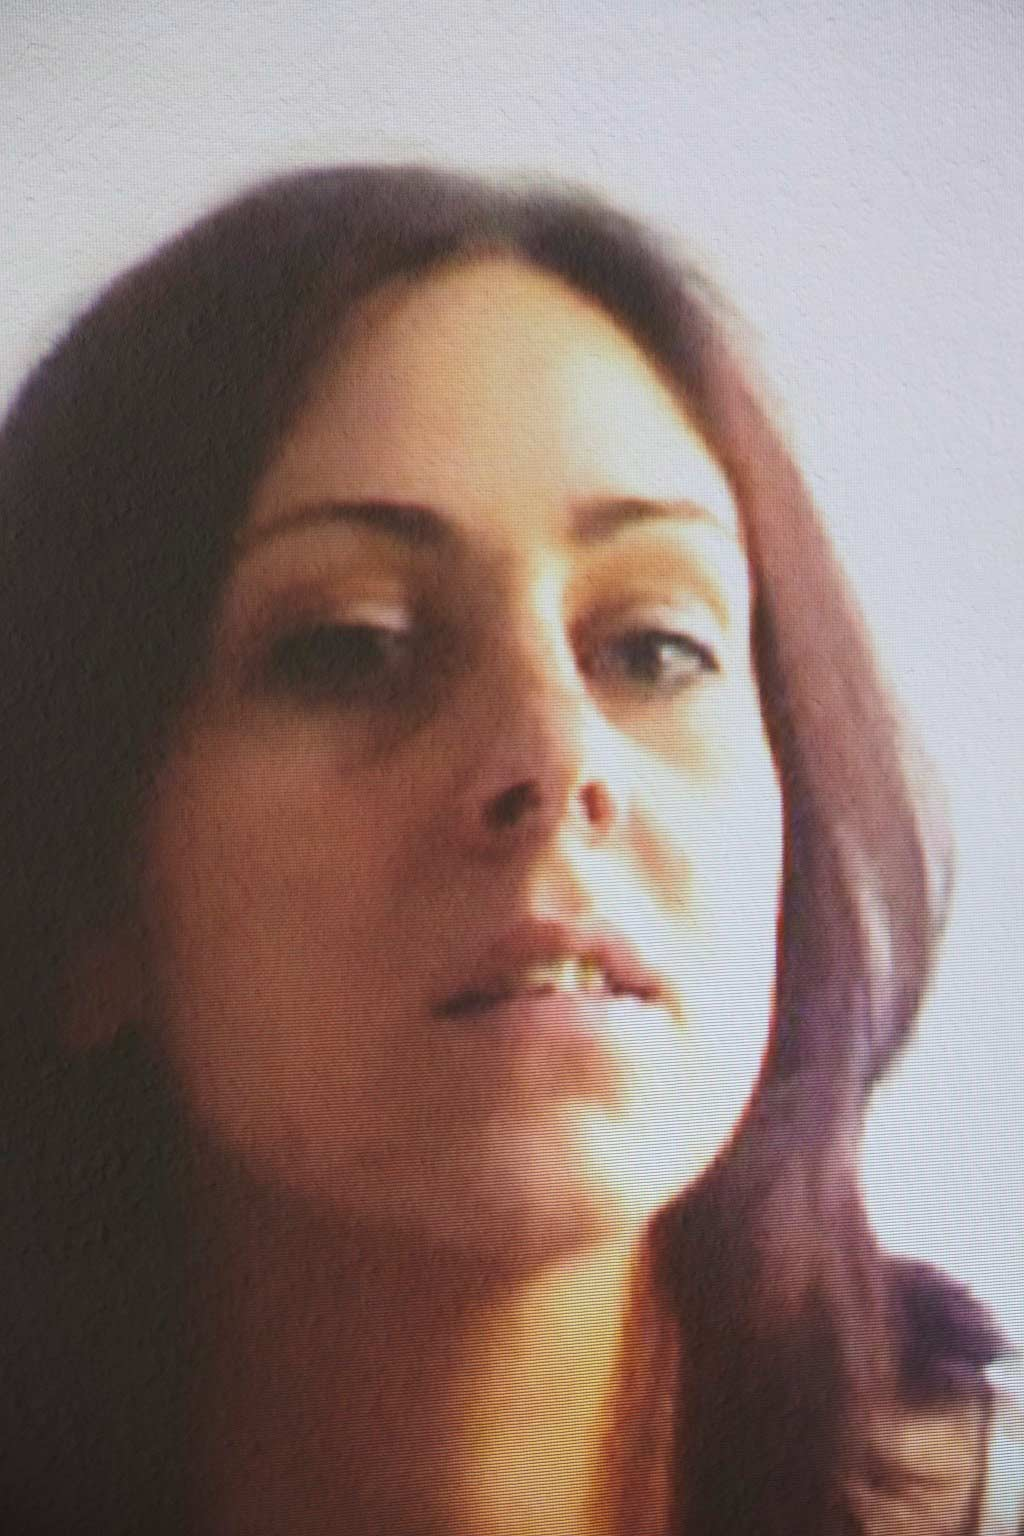 MATILDA, 29, LONDON, ENGLAND matildatandandand25